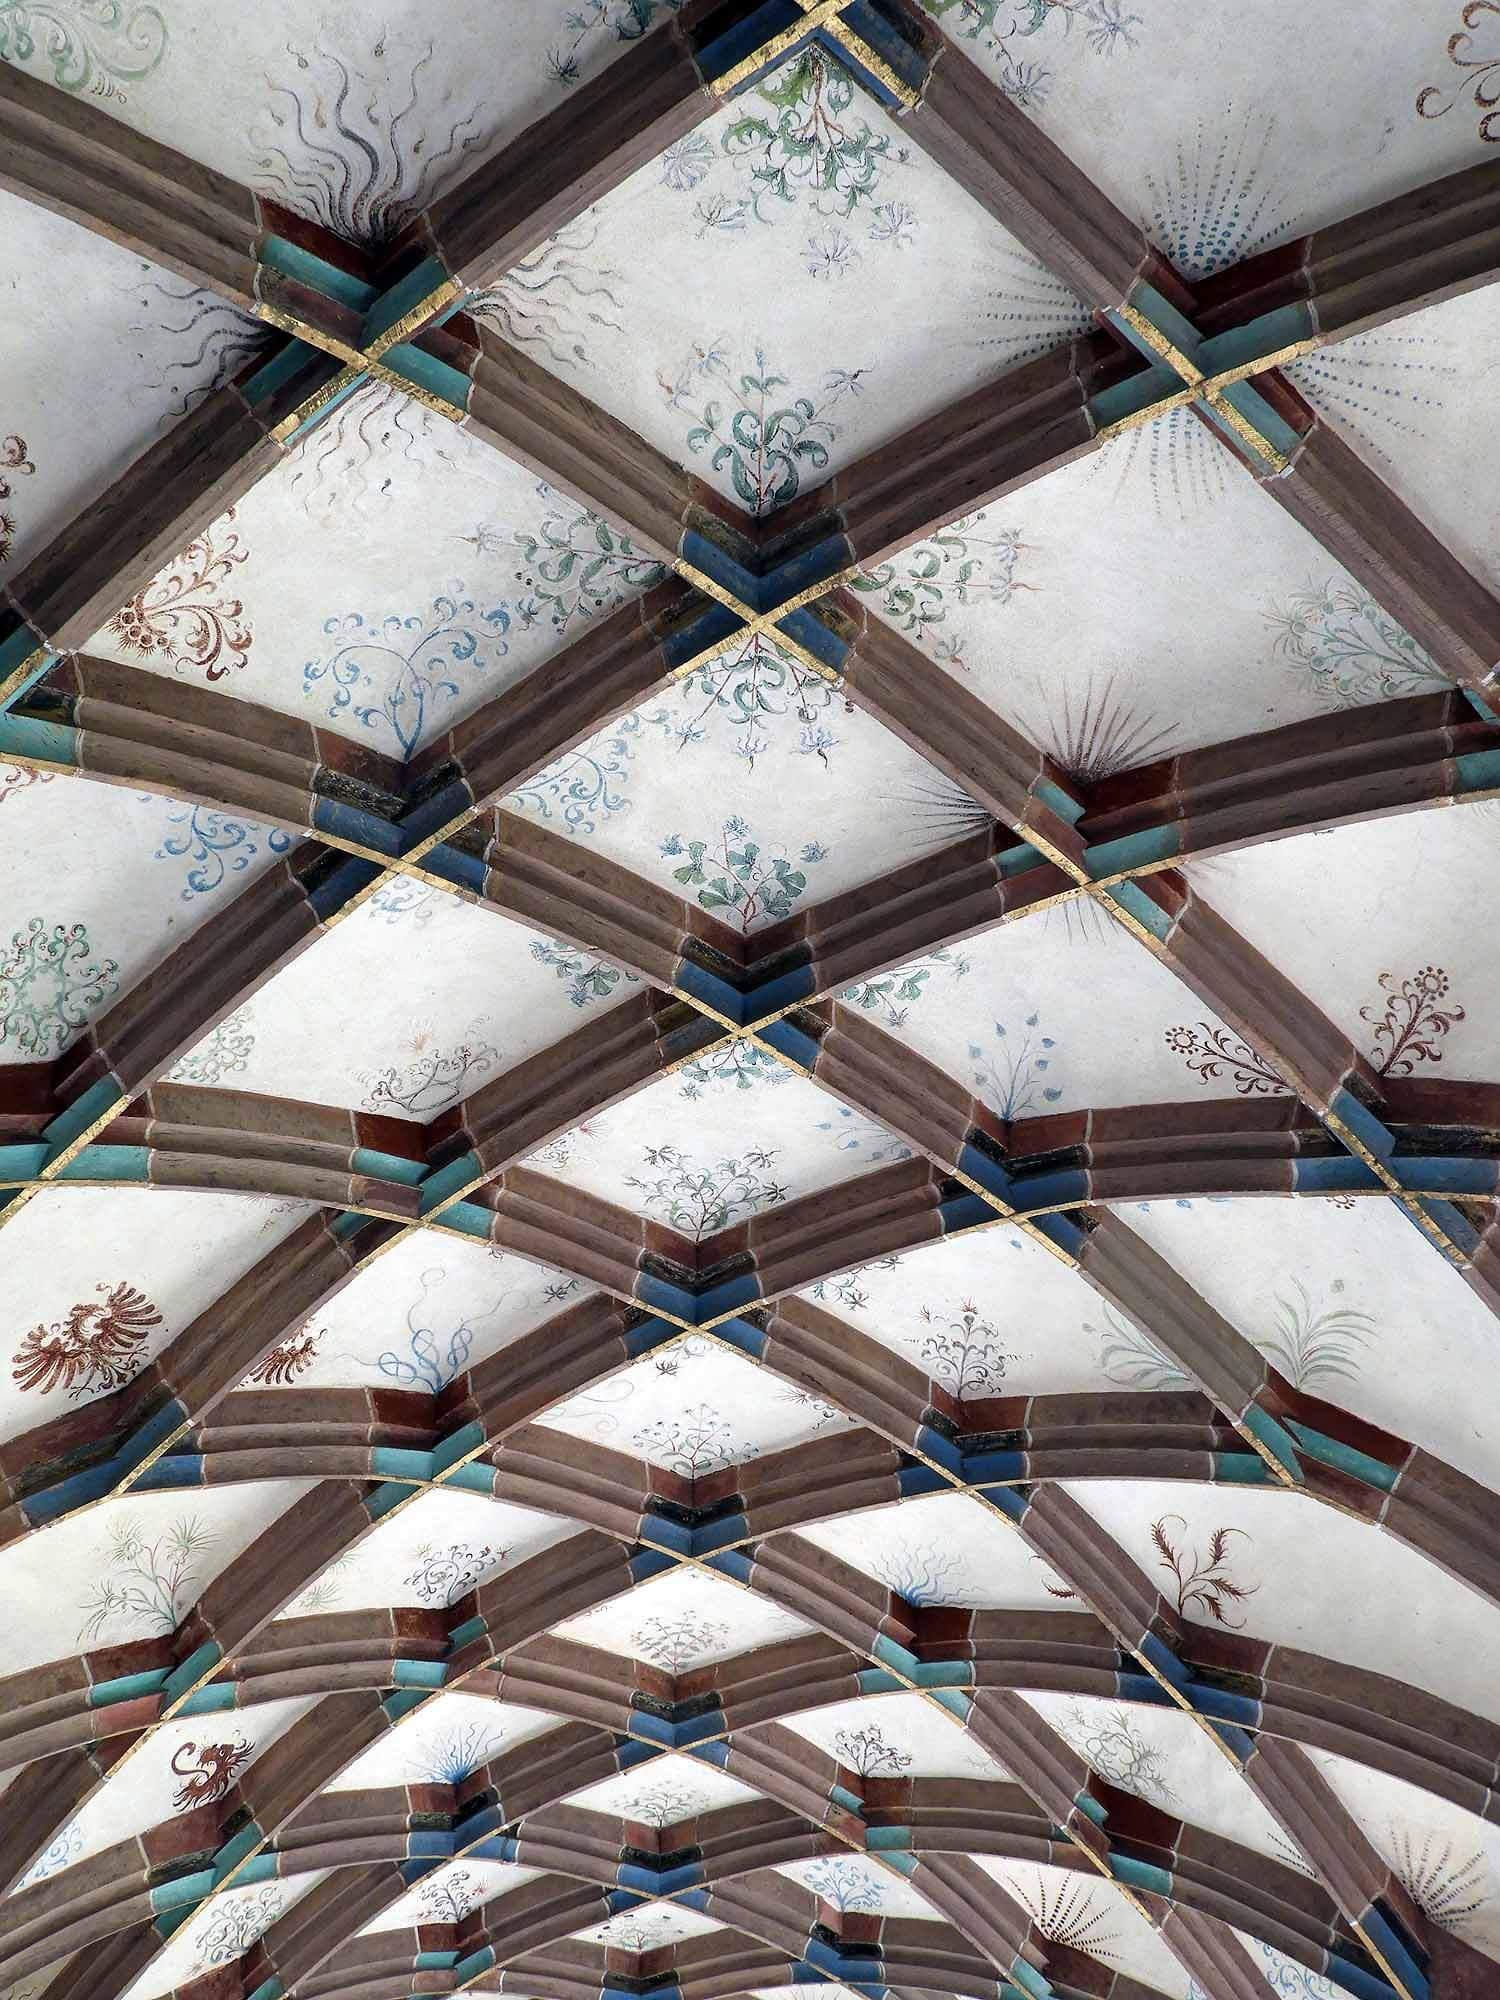 germany-kloster-maulbronn-ceiling-paintings.JPG